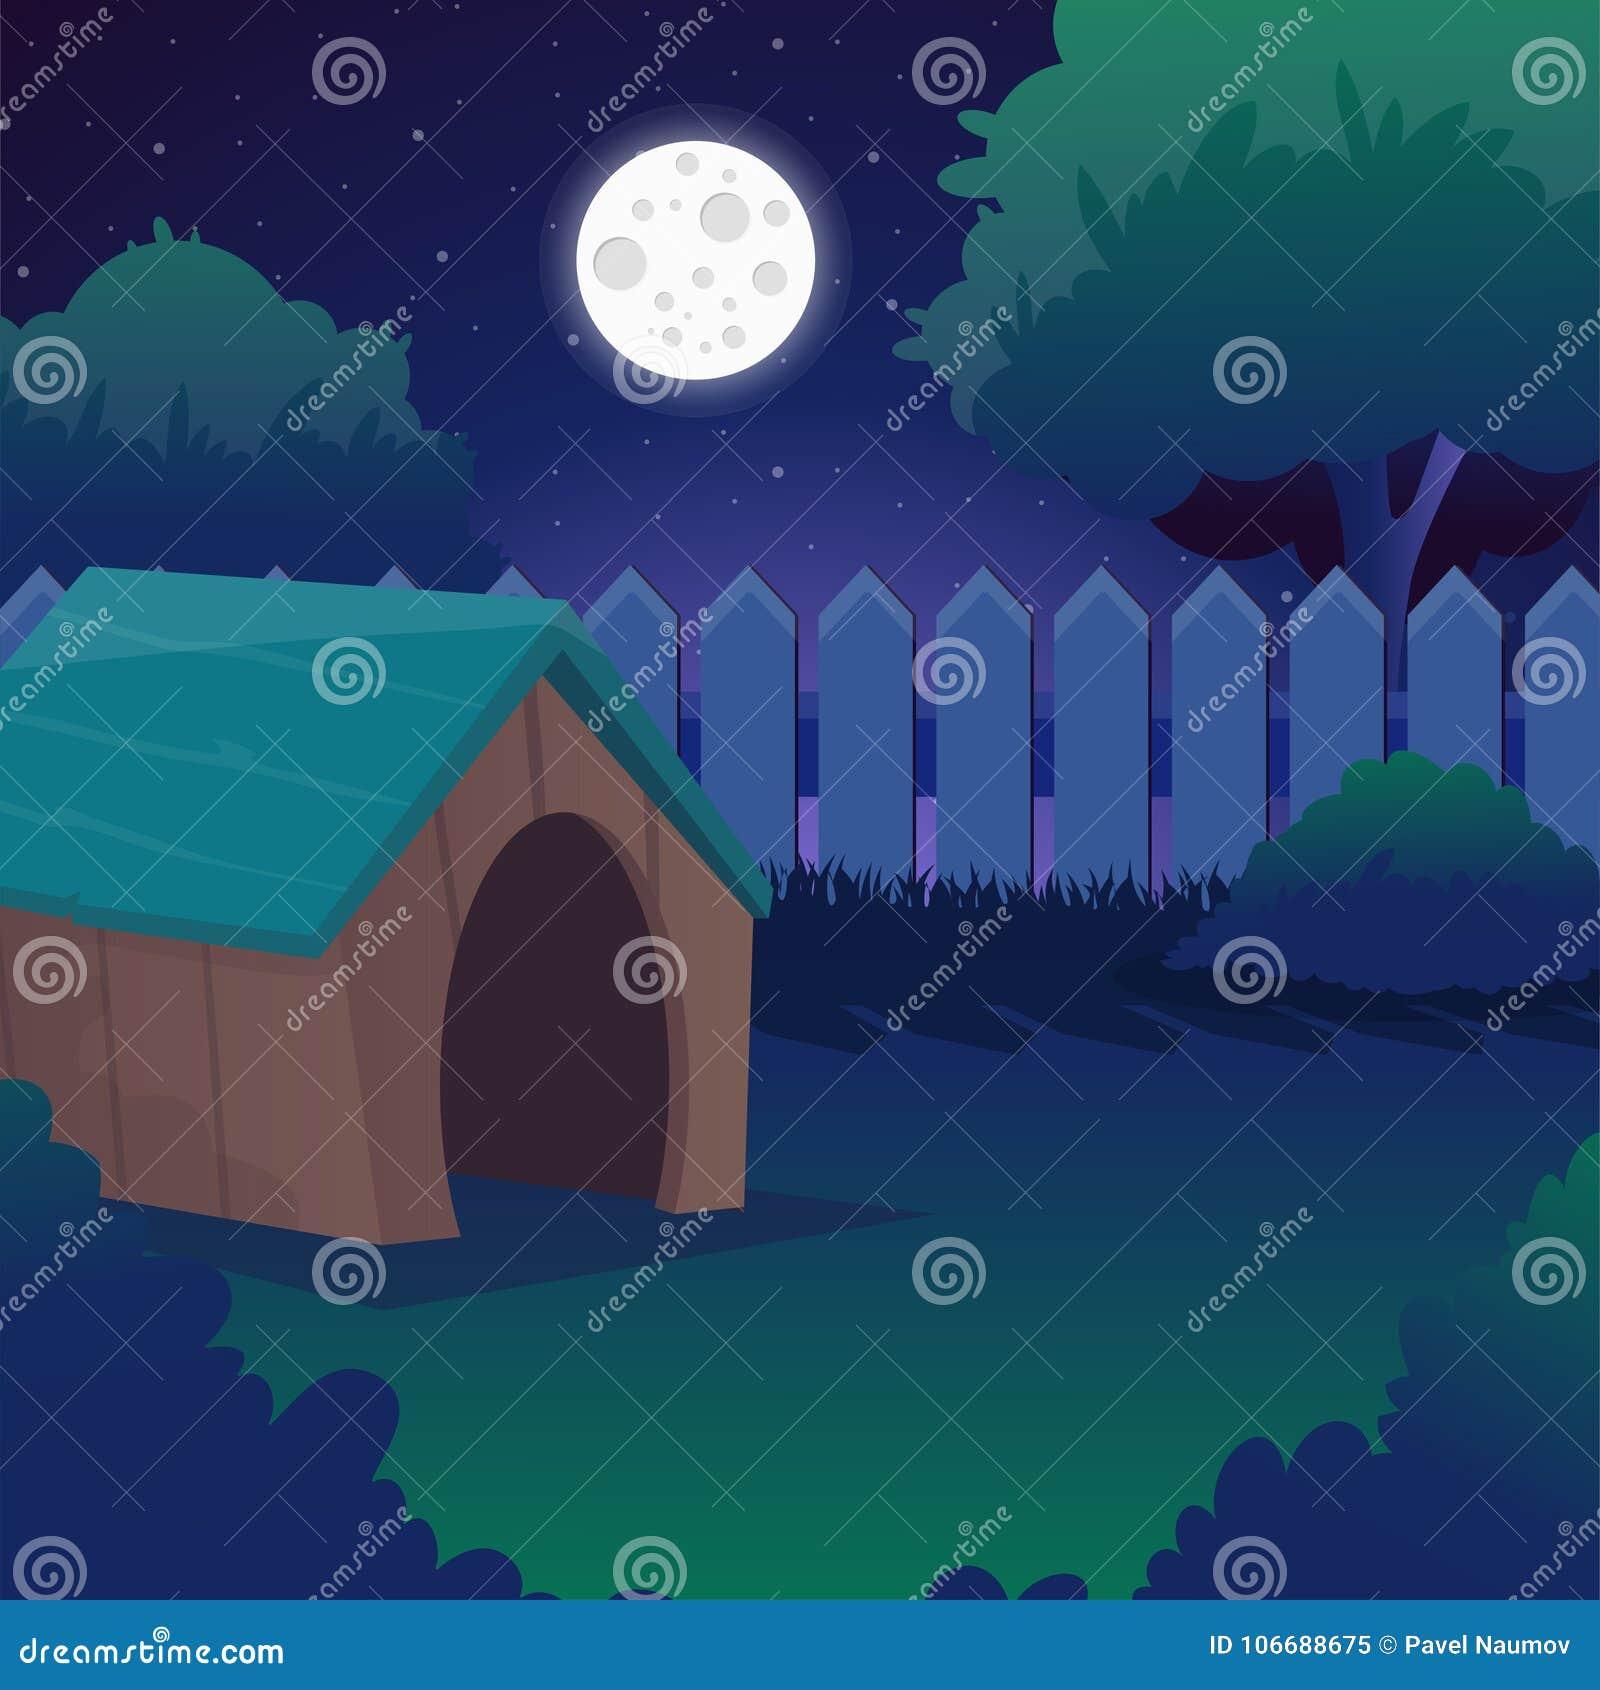 Cartoon Night Landscape With Starry Sky, Full Moon, Trees ...